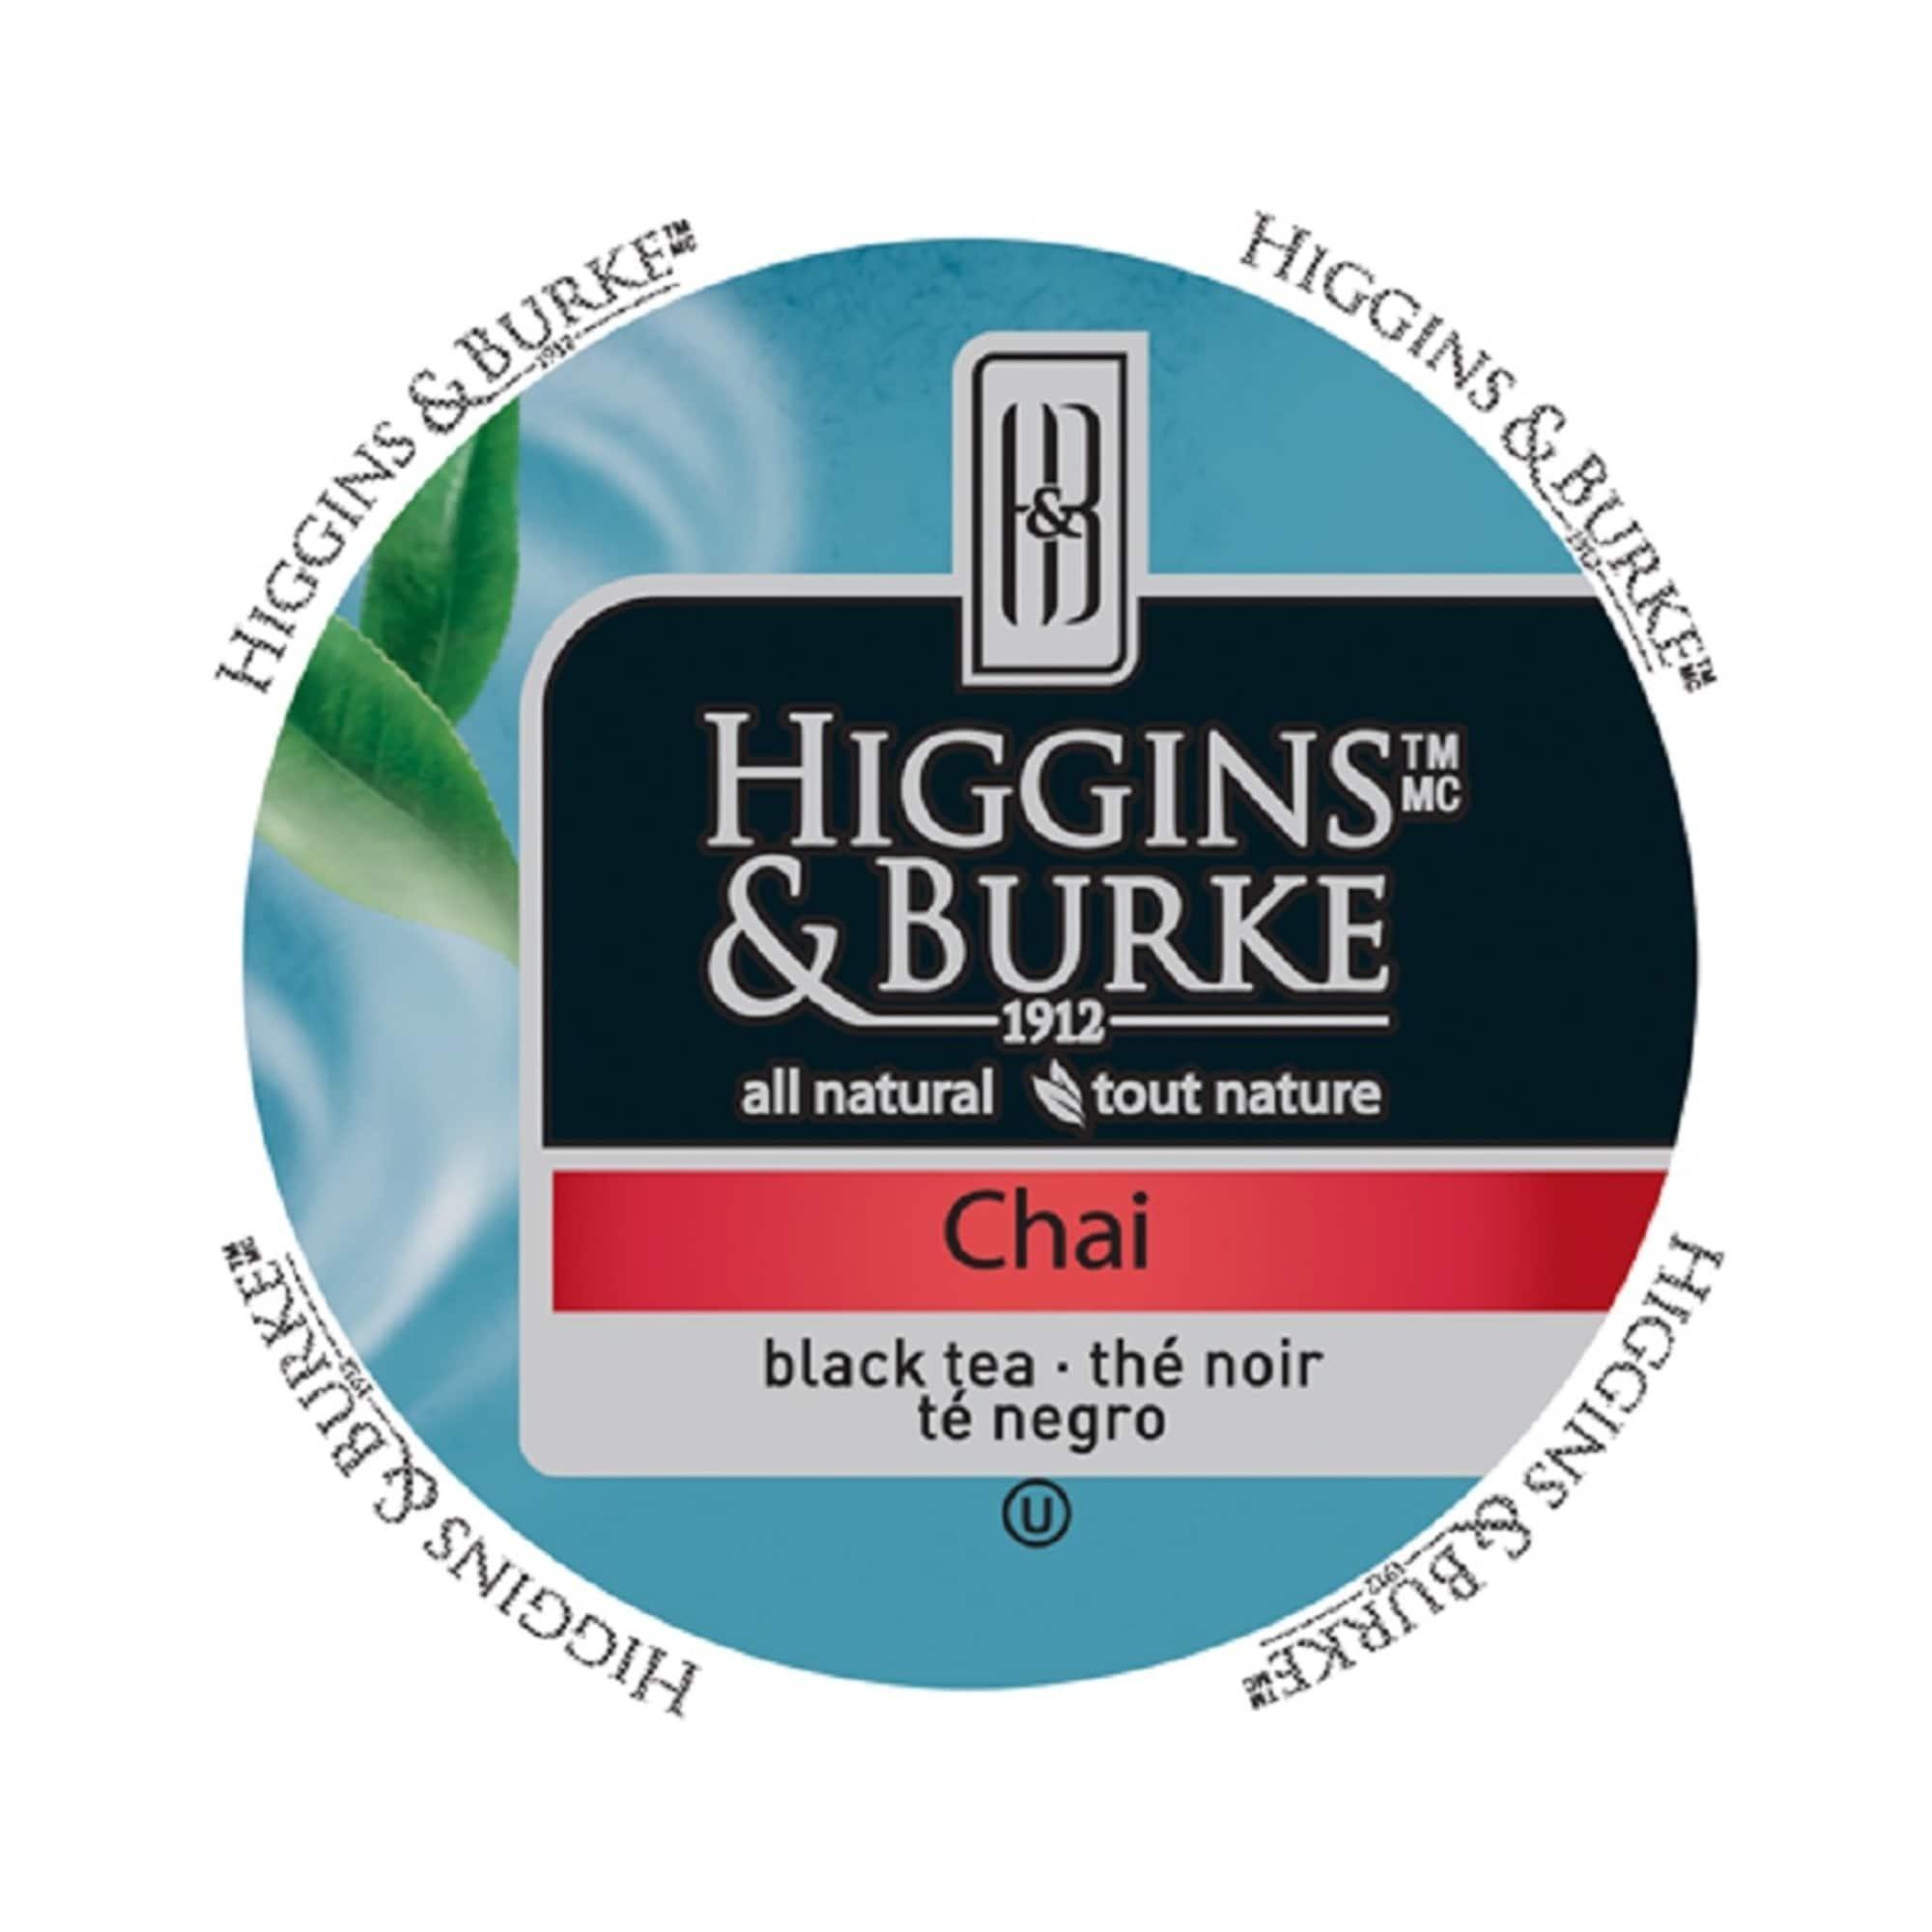 Parker Higgins & Burke Specialty Tea Chai RealCup portion...